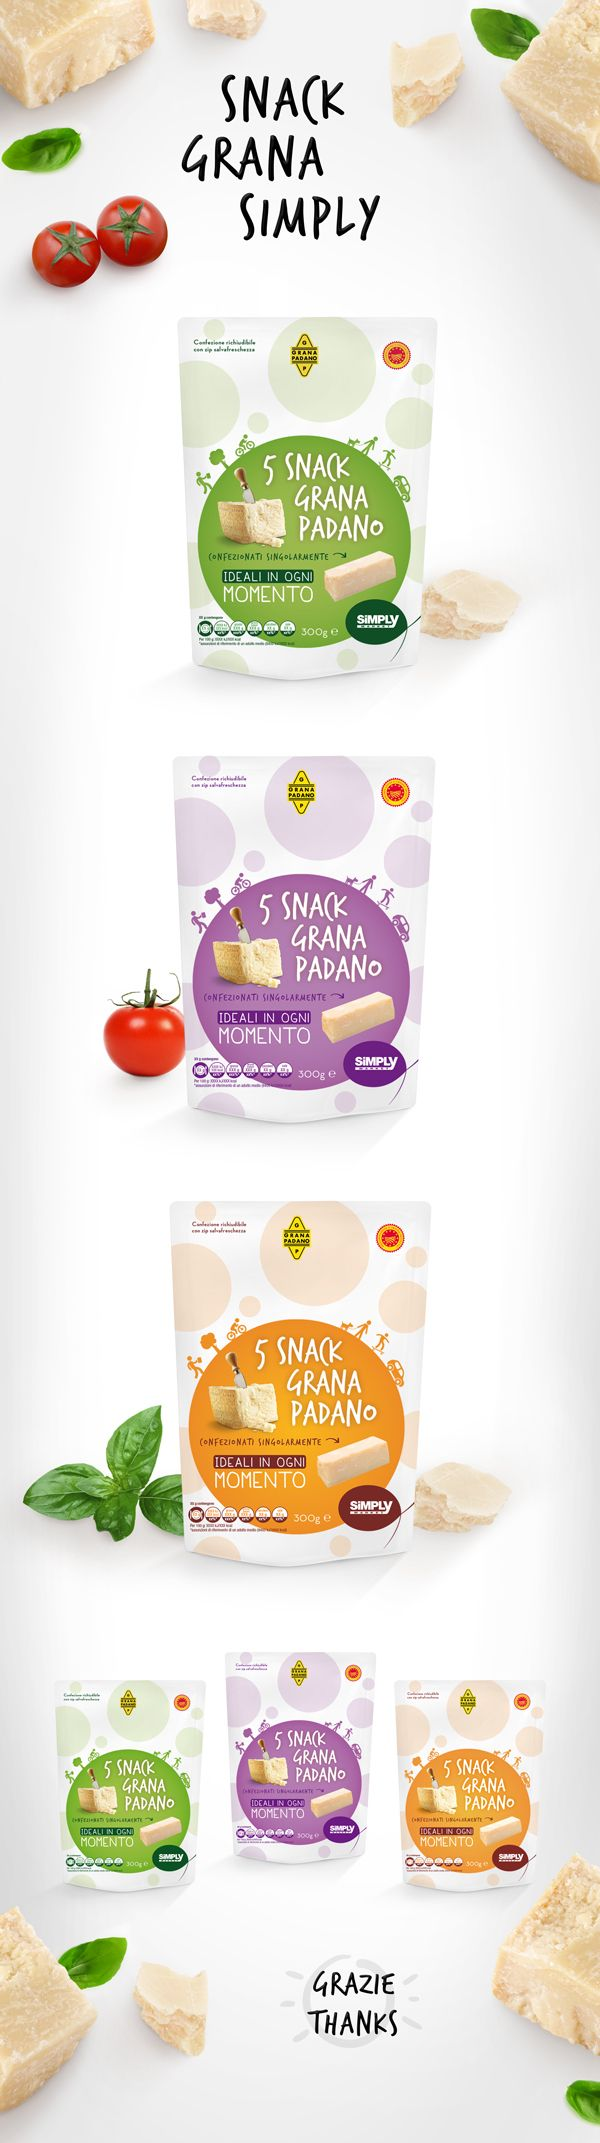 Snack Grana Padano by Viola Moroni, via Behance